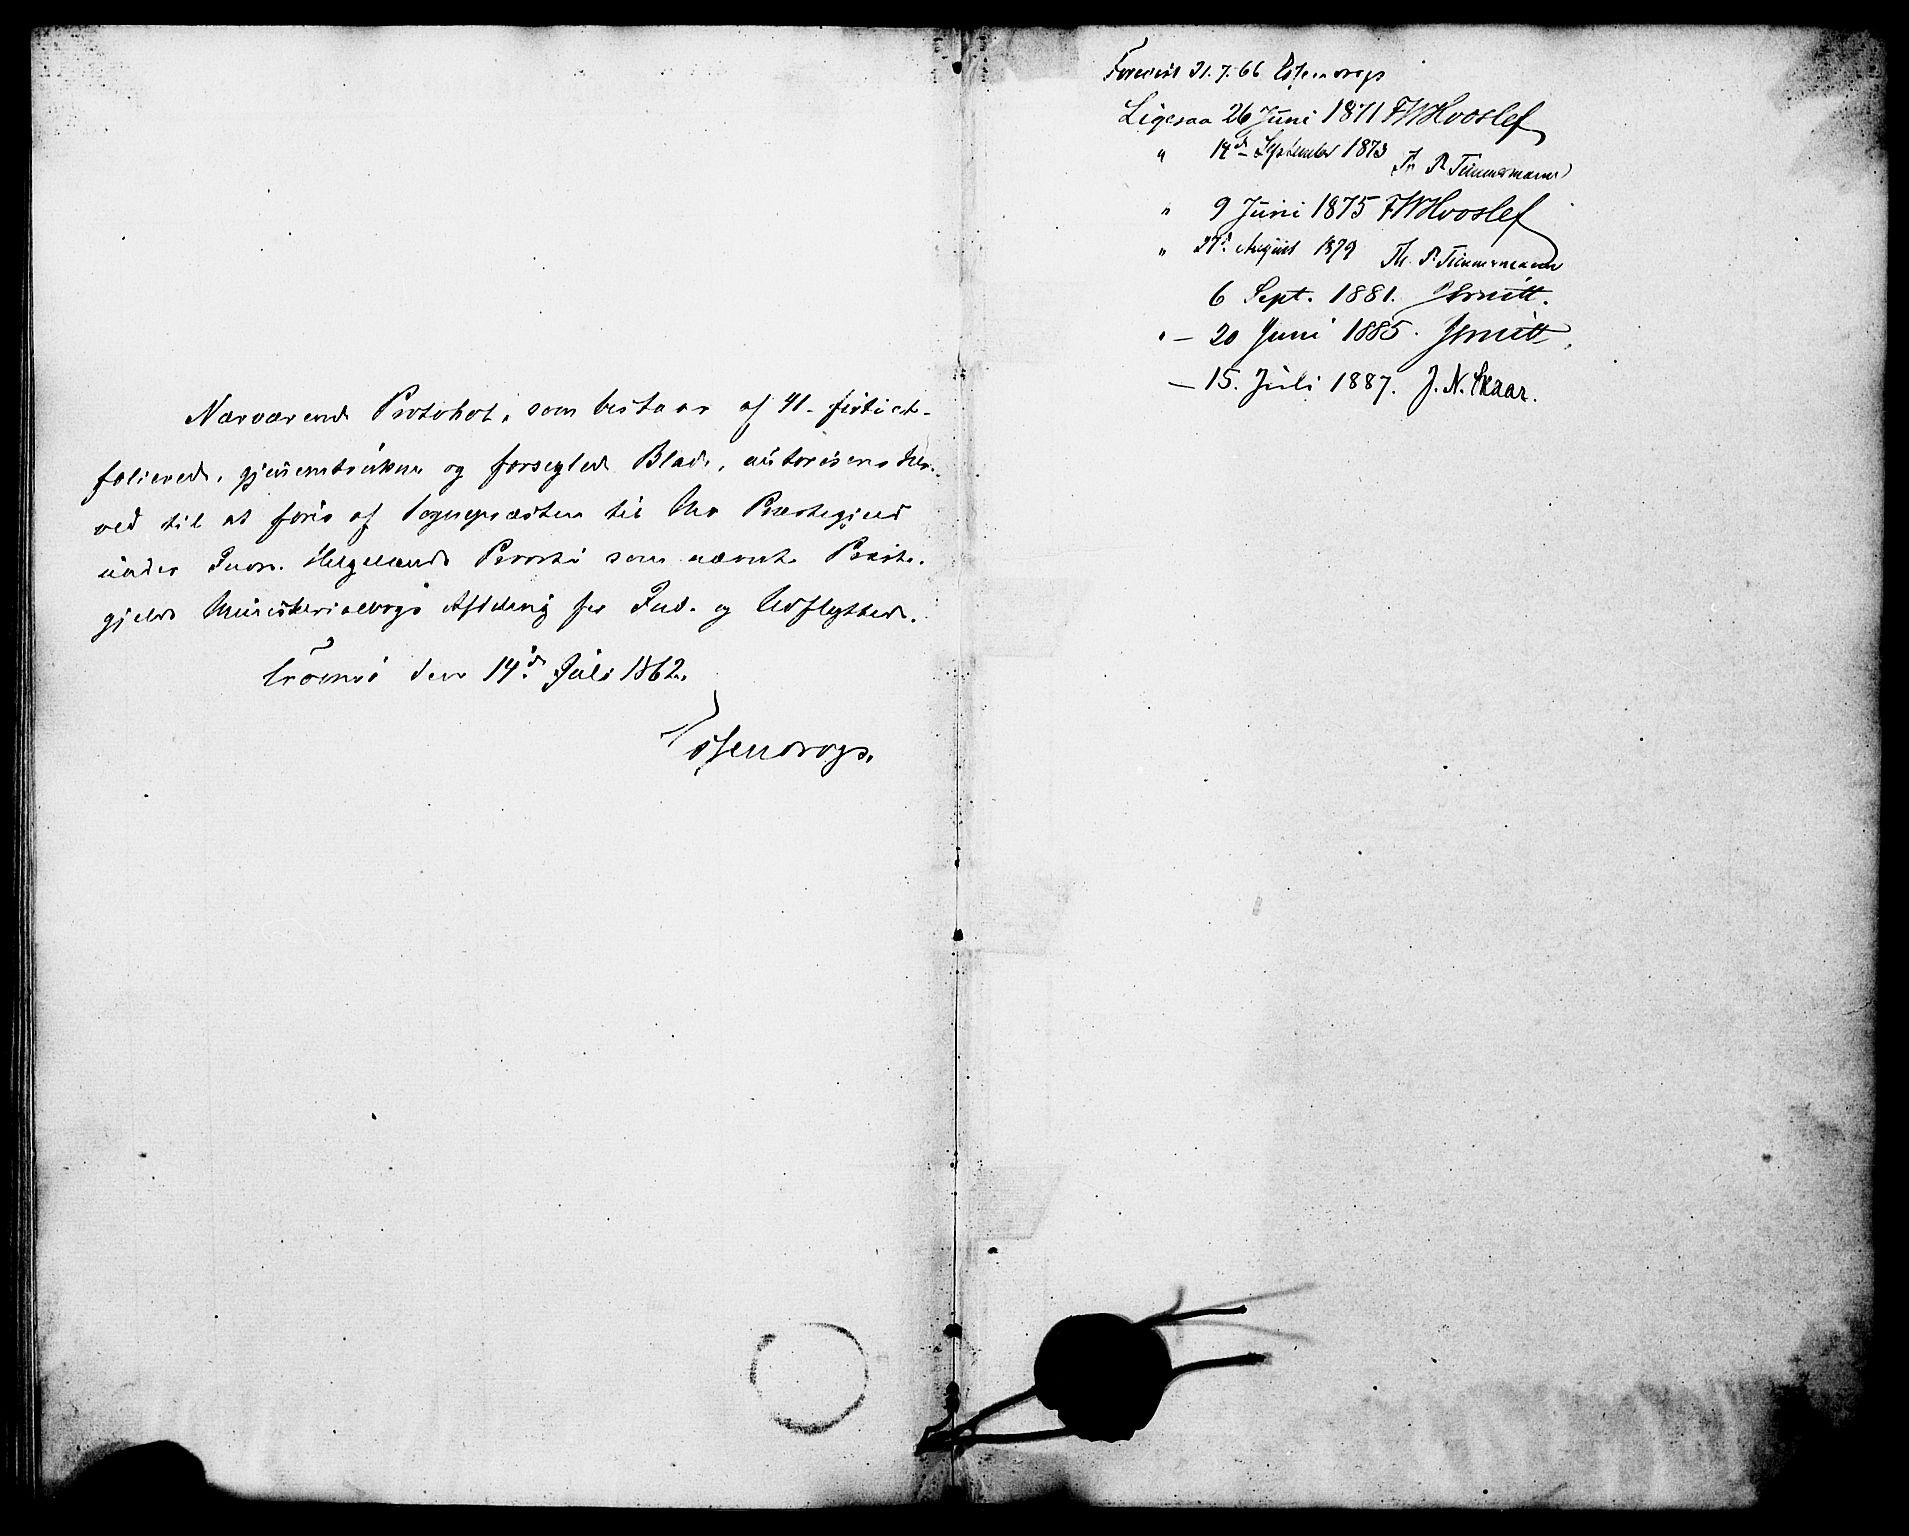 SAT, Ministerialprotokoller, klokkerbøker og fødselsregistre - Nordland, 827/L0398: Ministerialbok nr. 827A10, 1866-1886